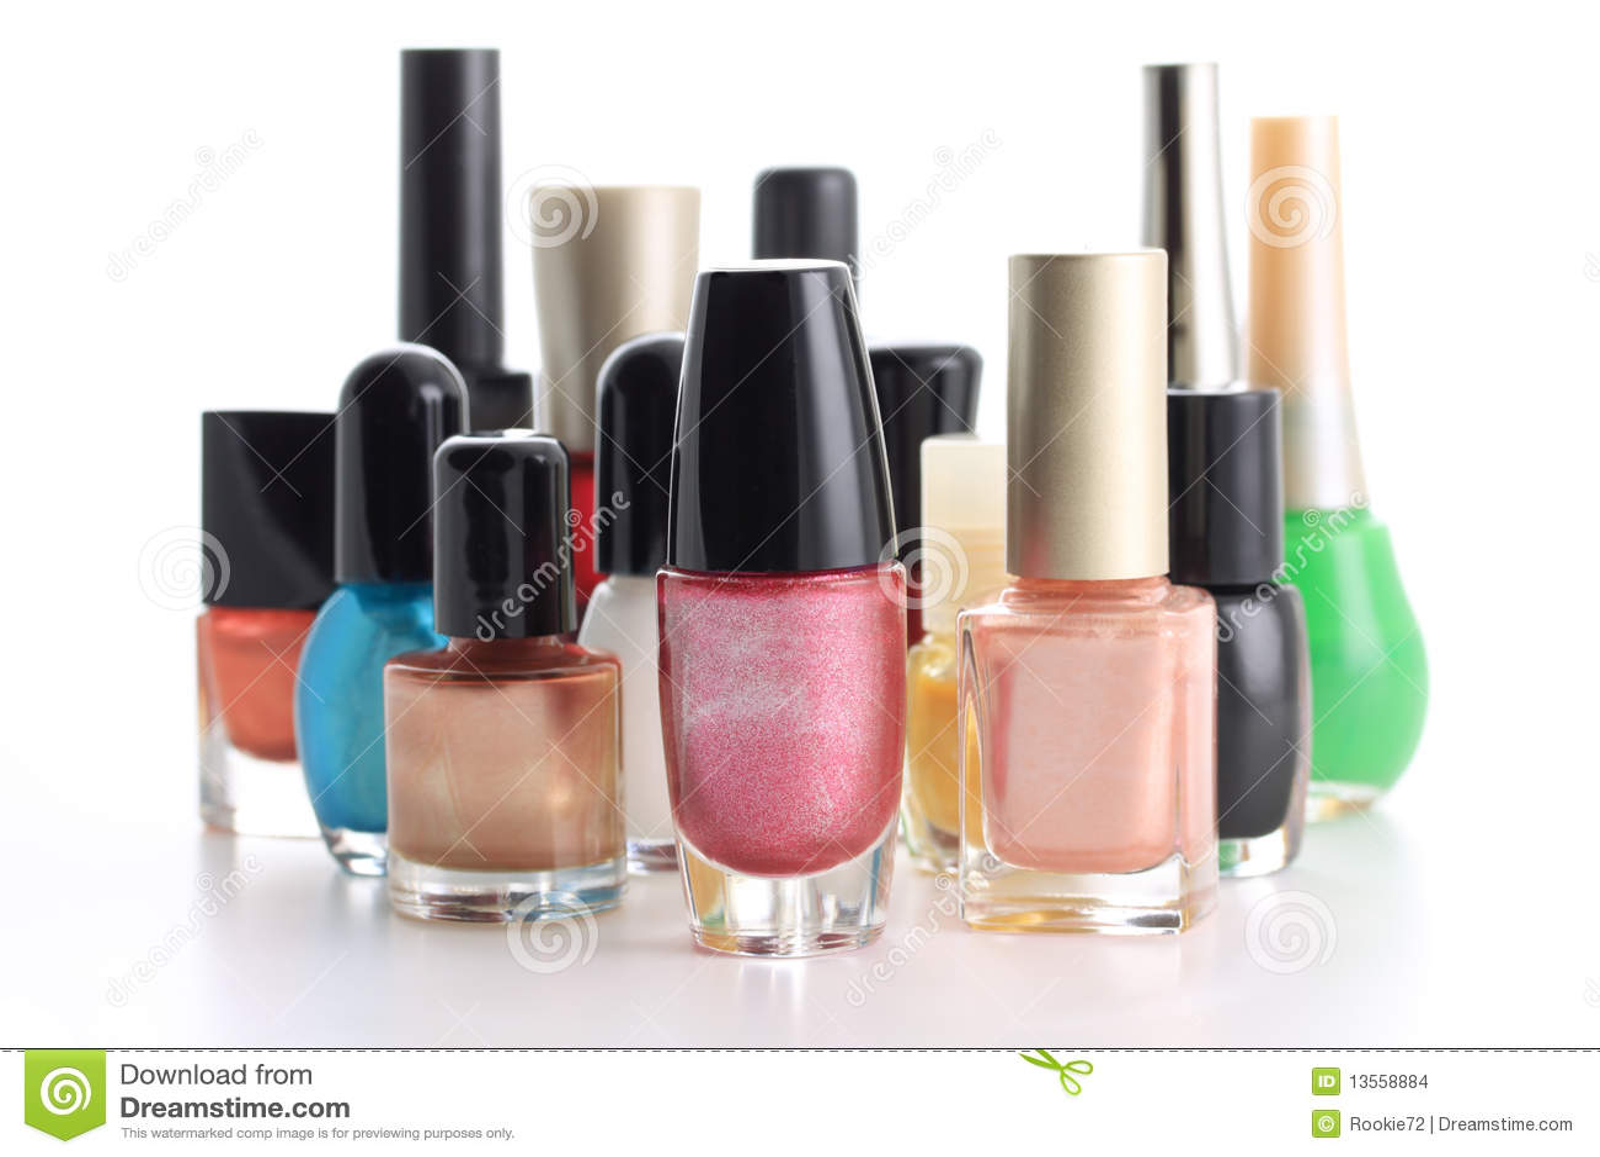 Nail Polish Bottle Composition Stock Photo - Image of beauty ...